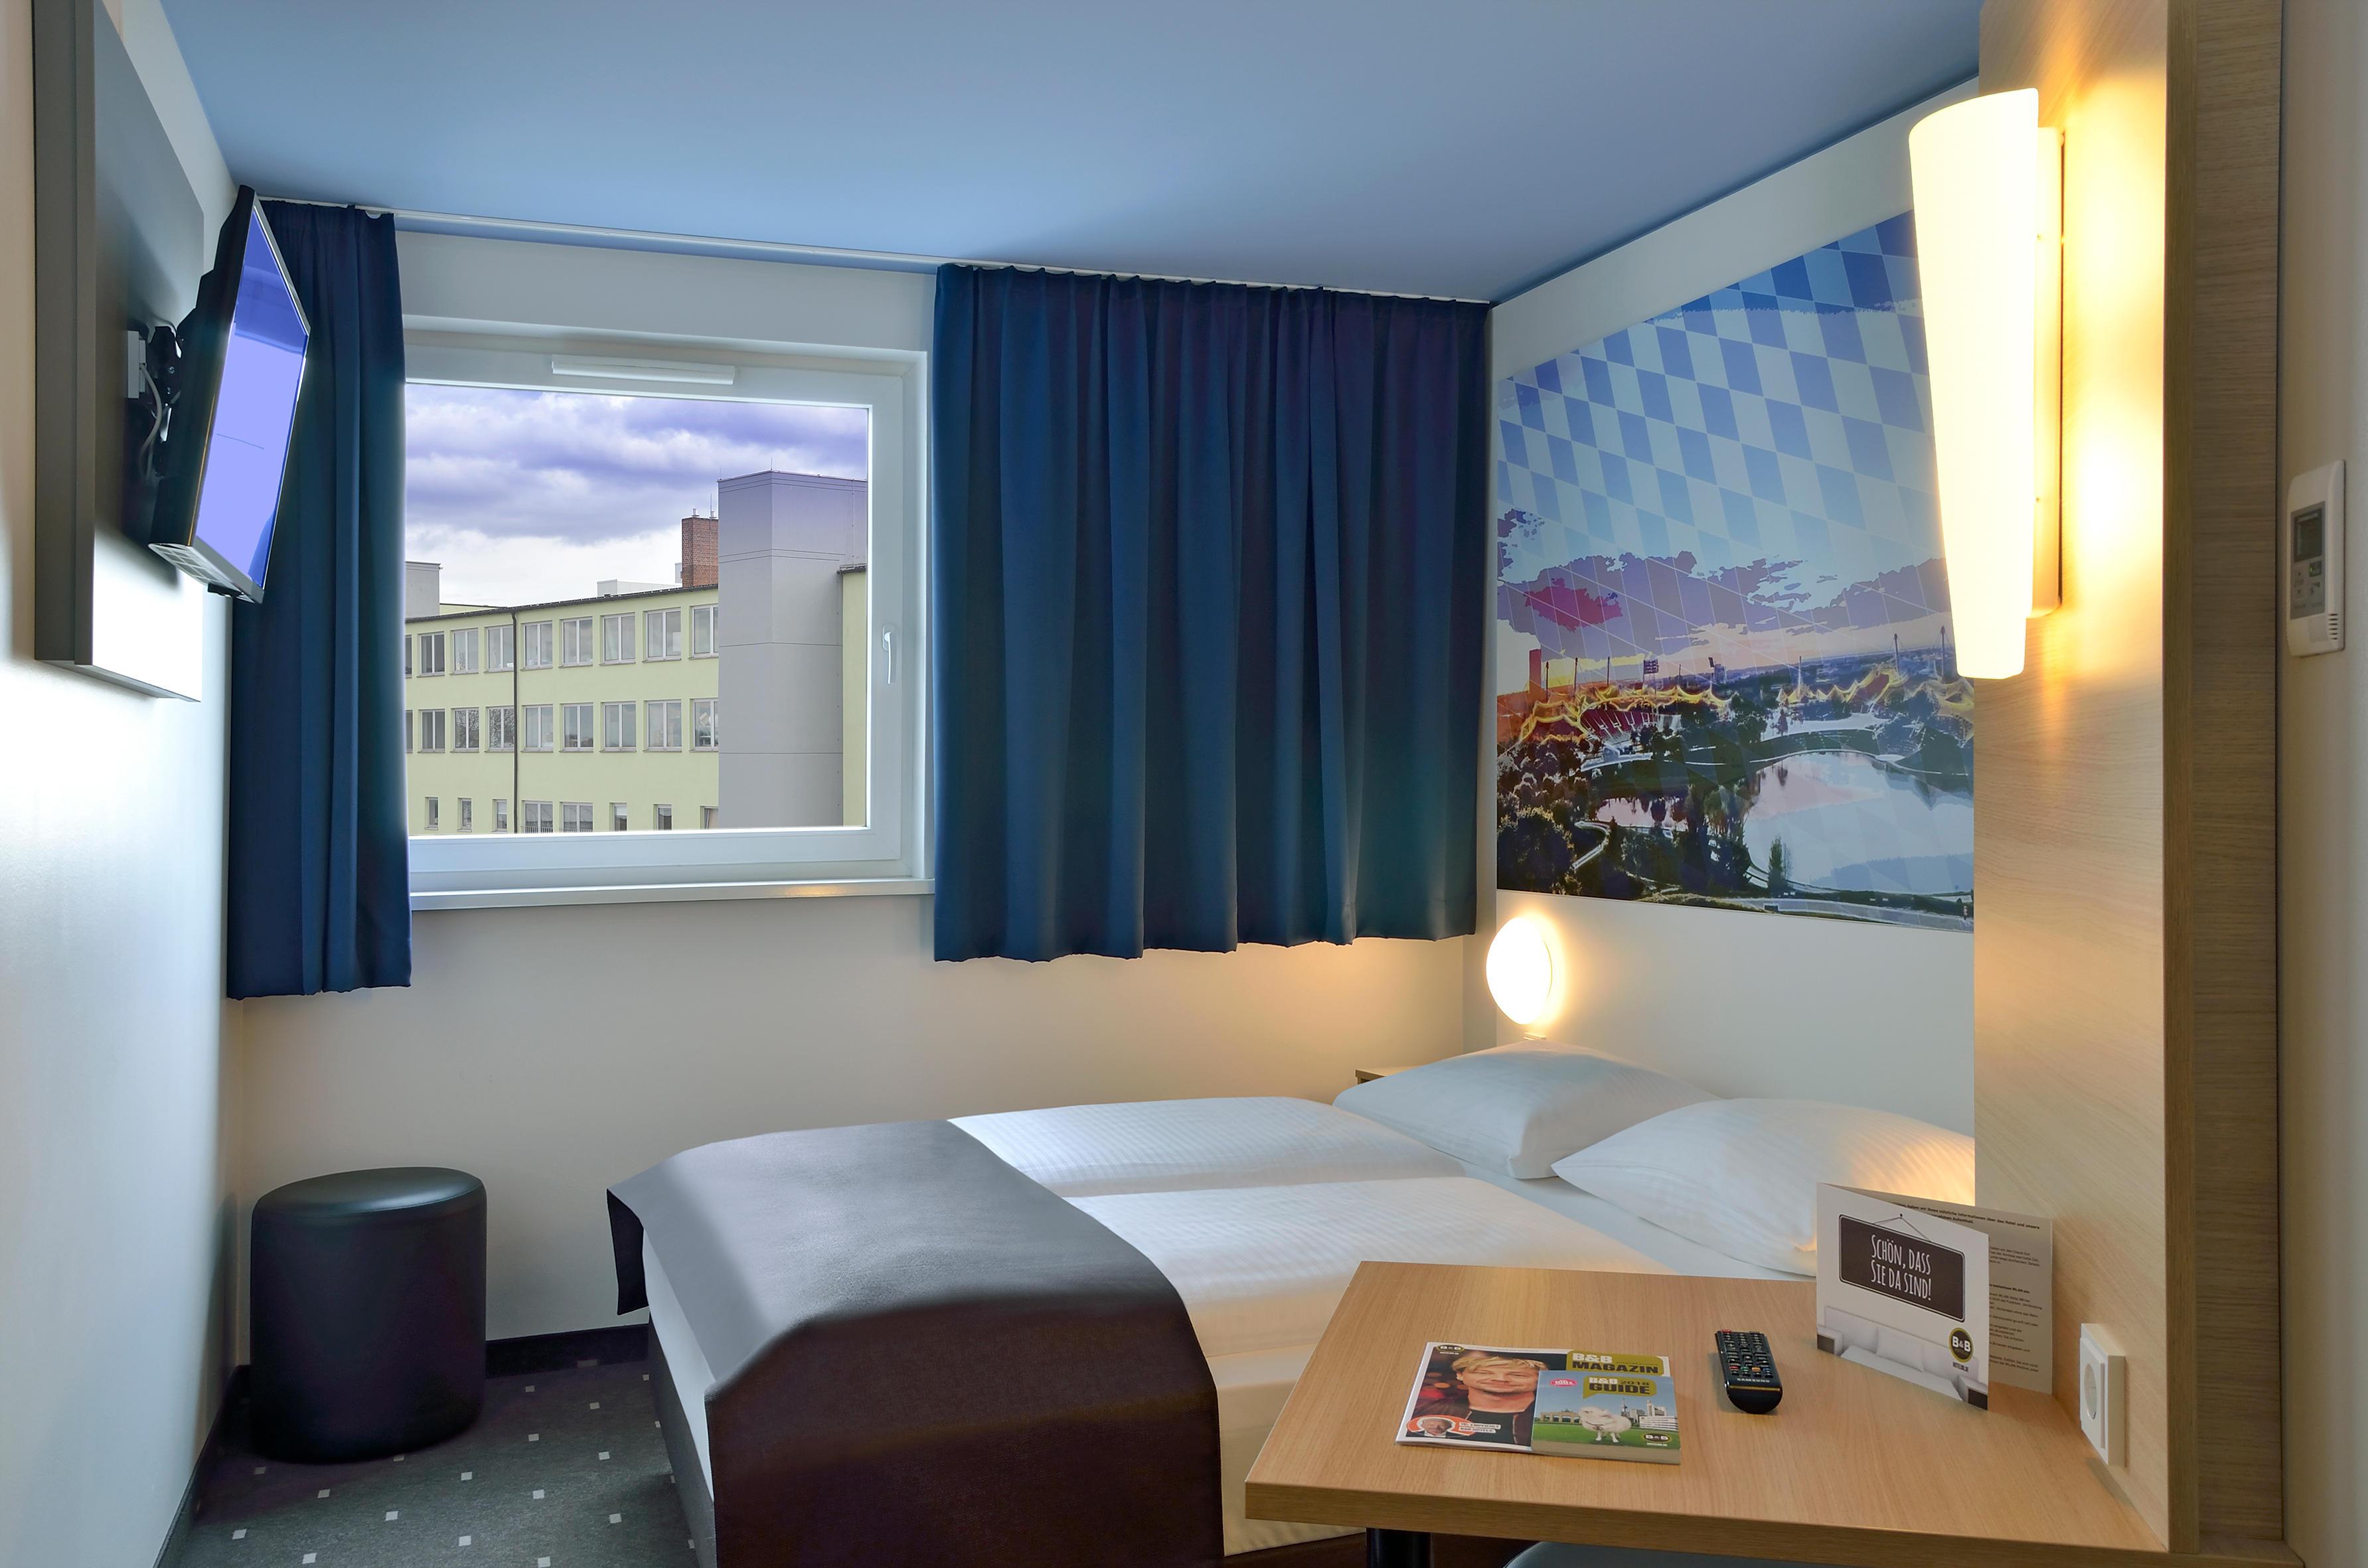 B Amp B Hotels 214 Ffnungszeiten B Amp B Hotels Frankfurter Ring